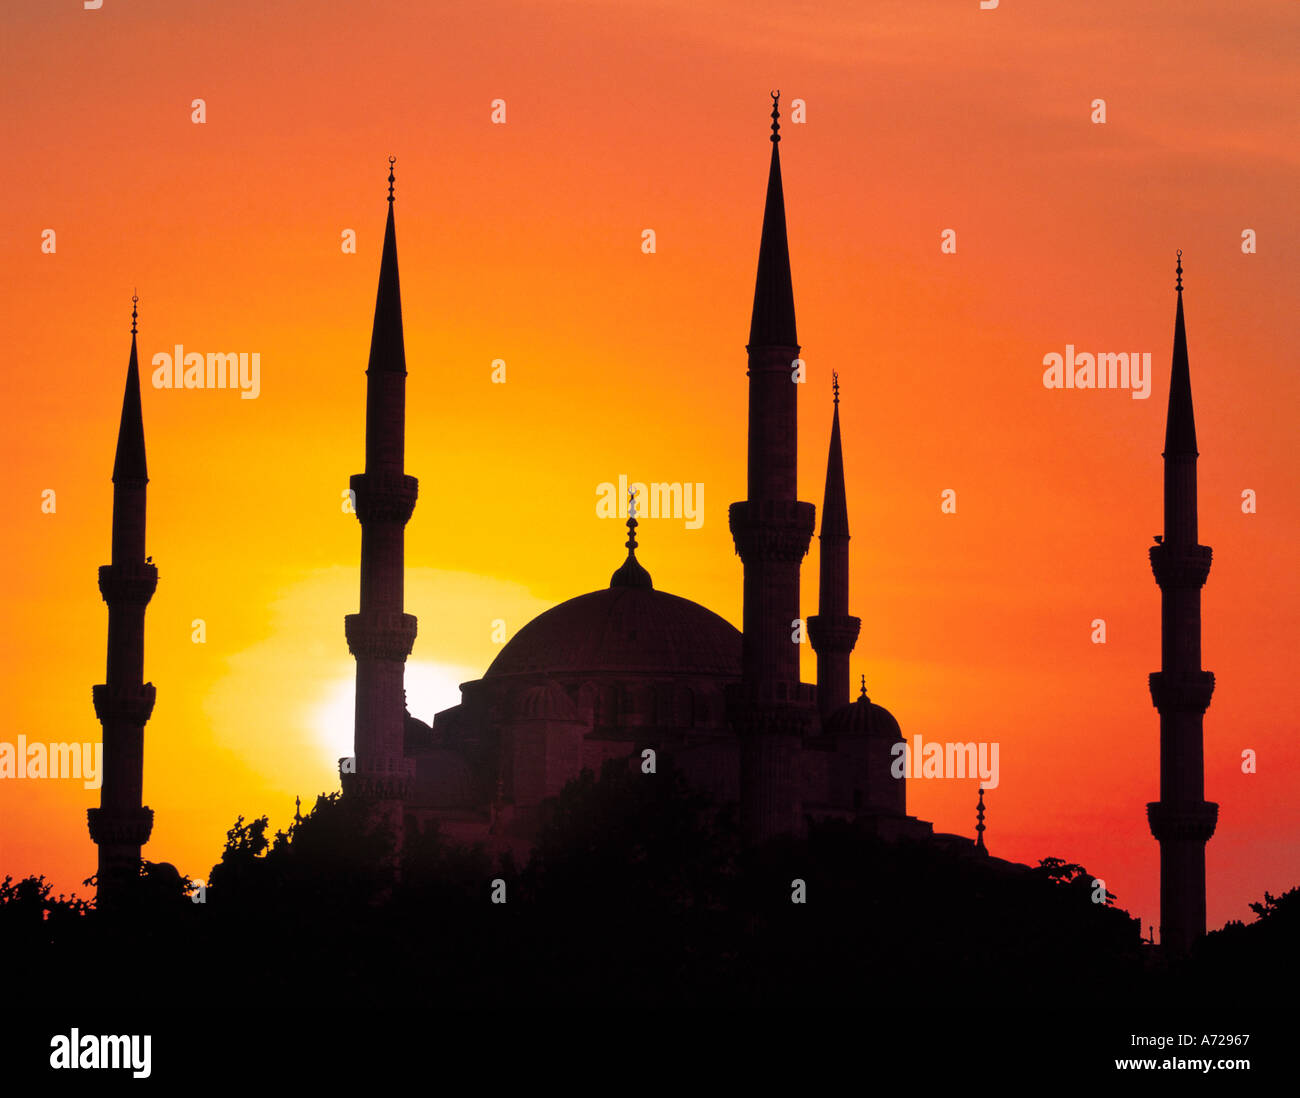 Mosquée Sultan Ahmet Camii Mosquée bleue à Istanbul Turquie Photo Stock